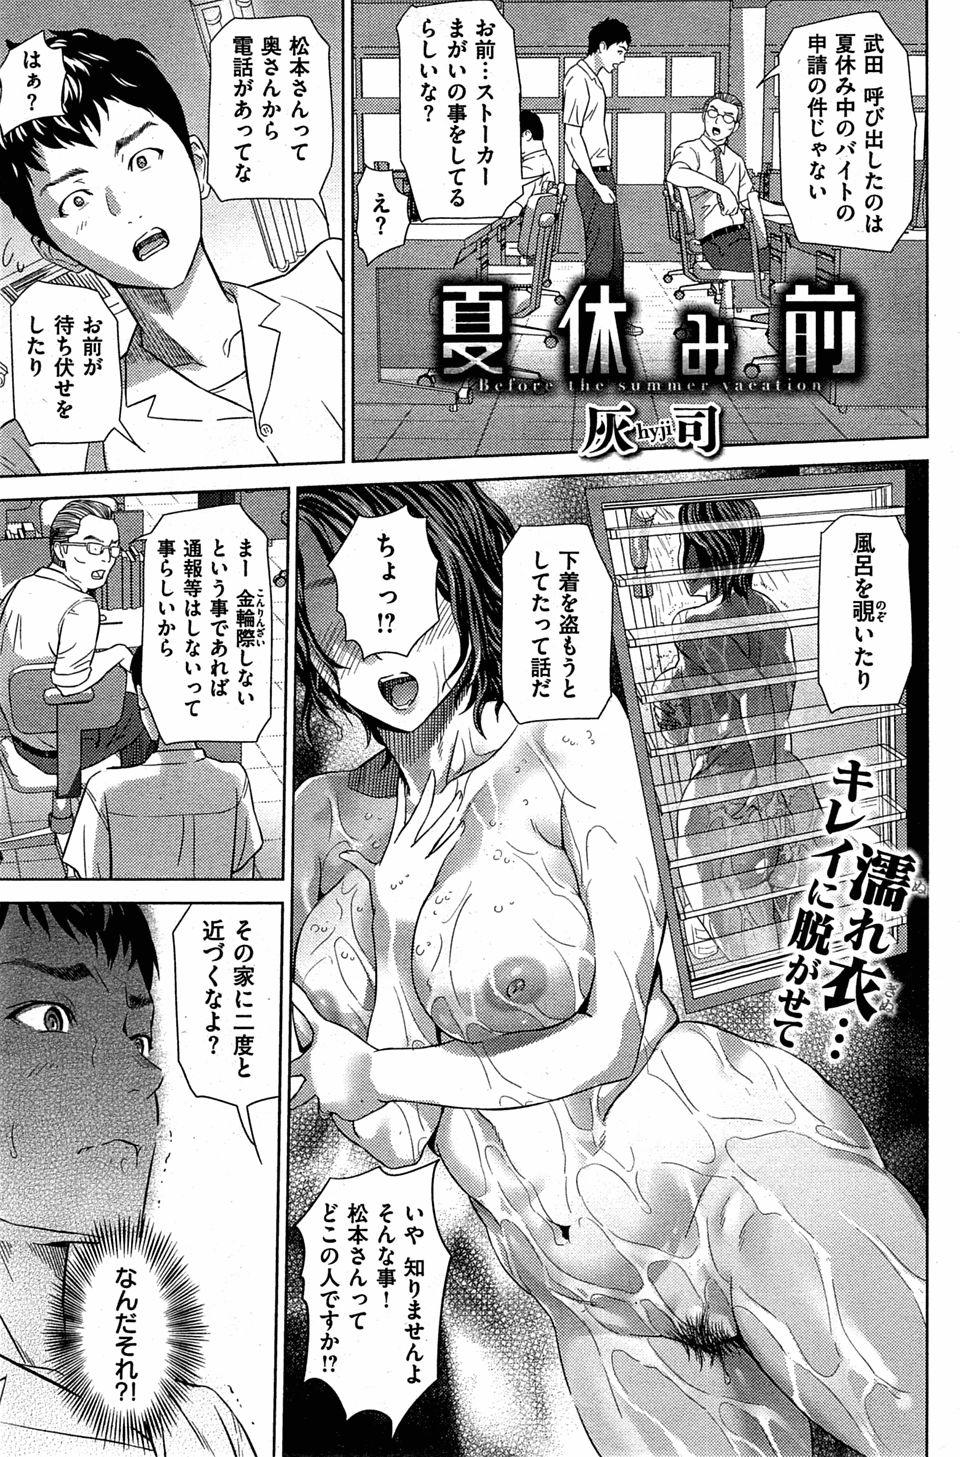 [灰司] 夏休み前 (1)